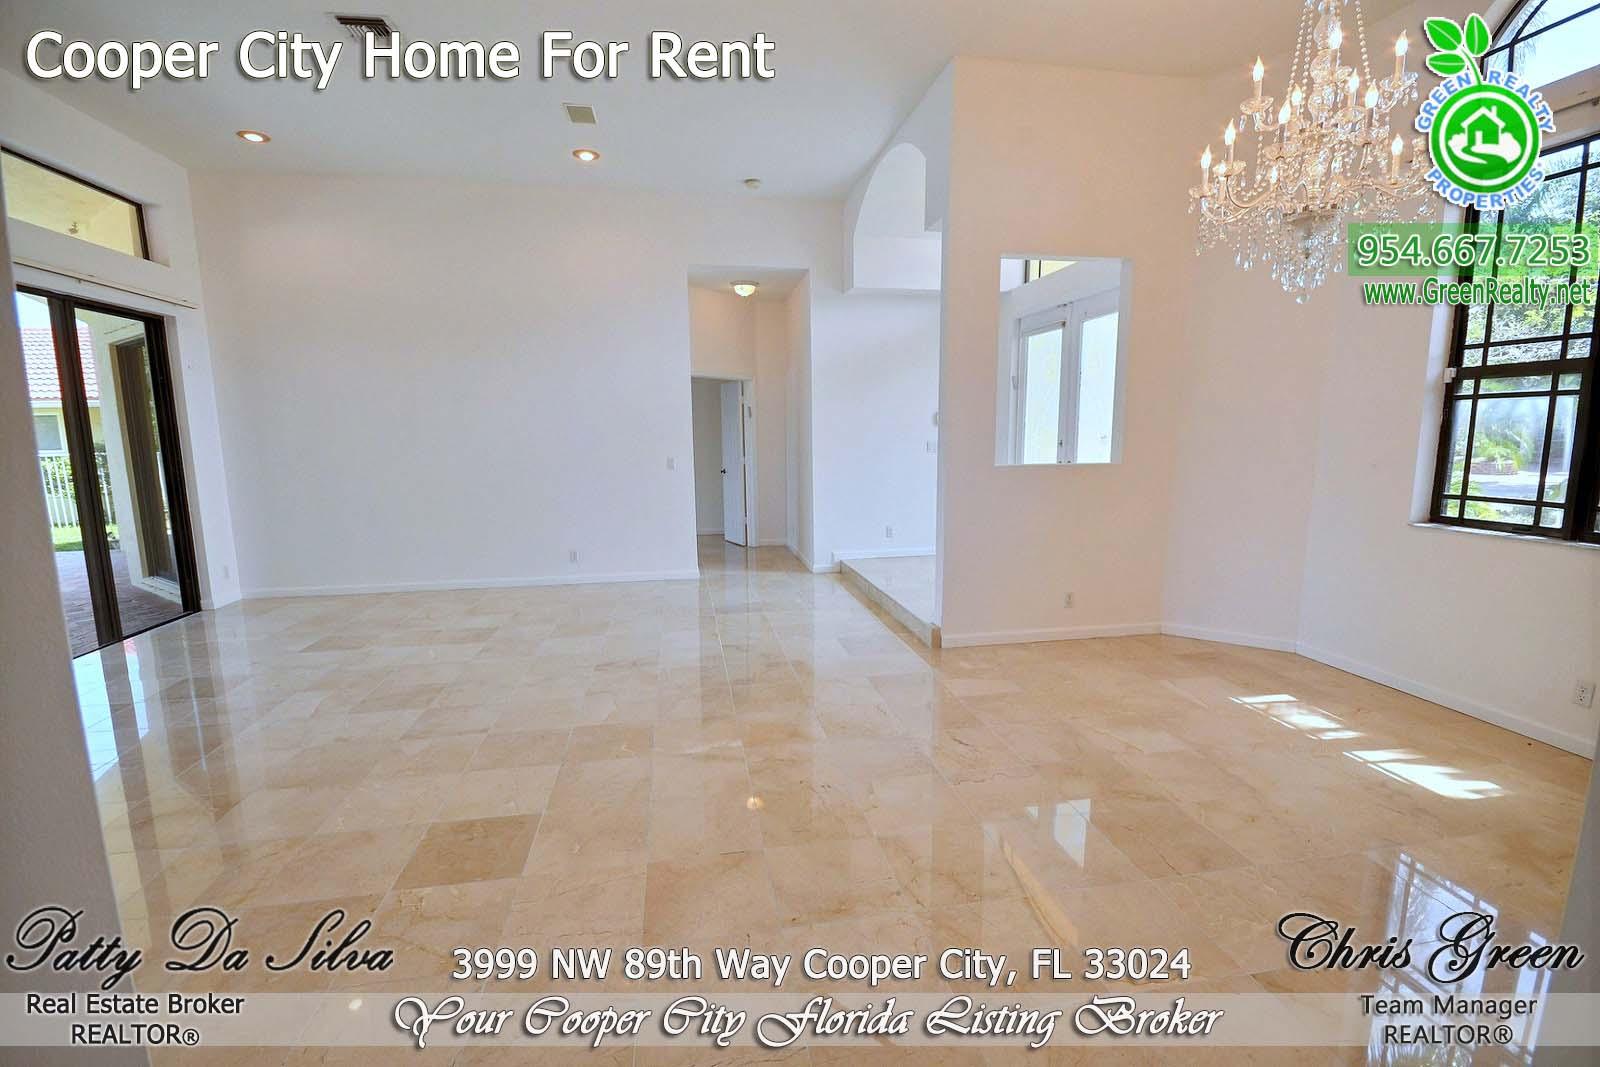 11 Cooper City Home Rentals (2)